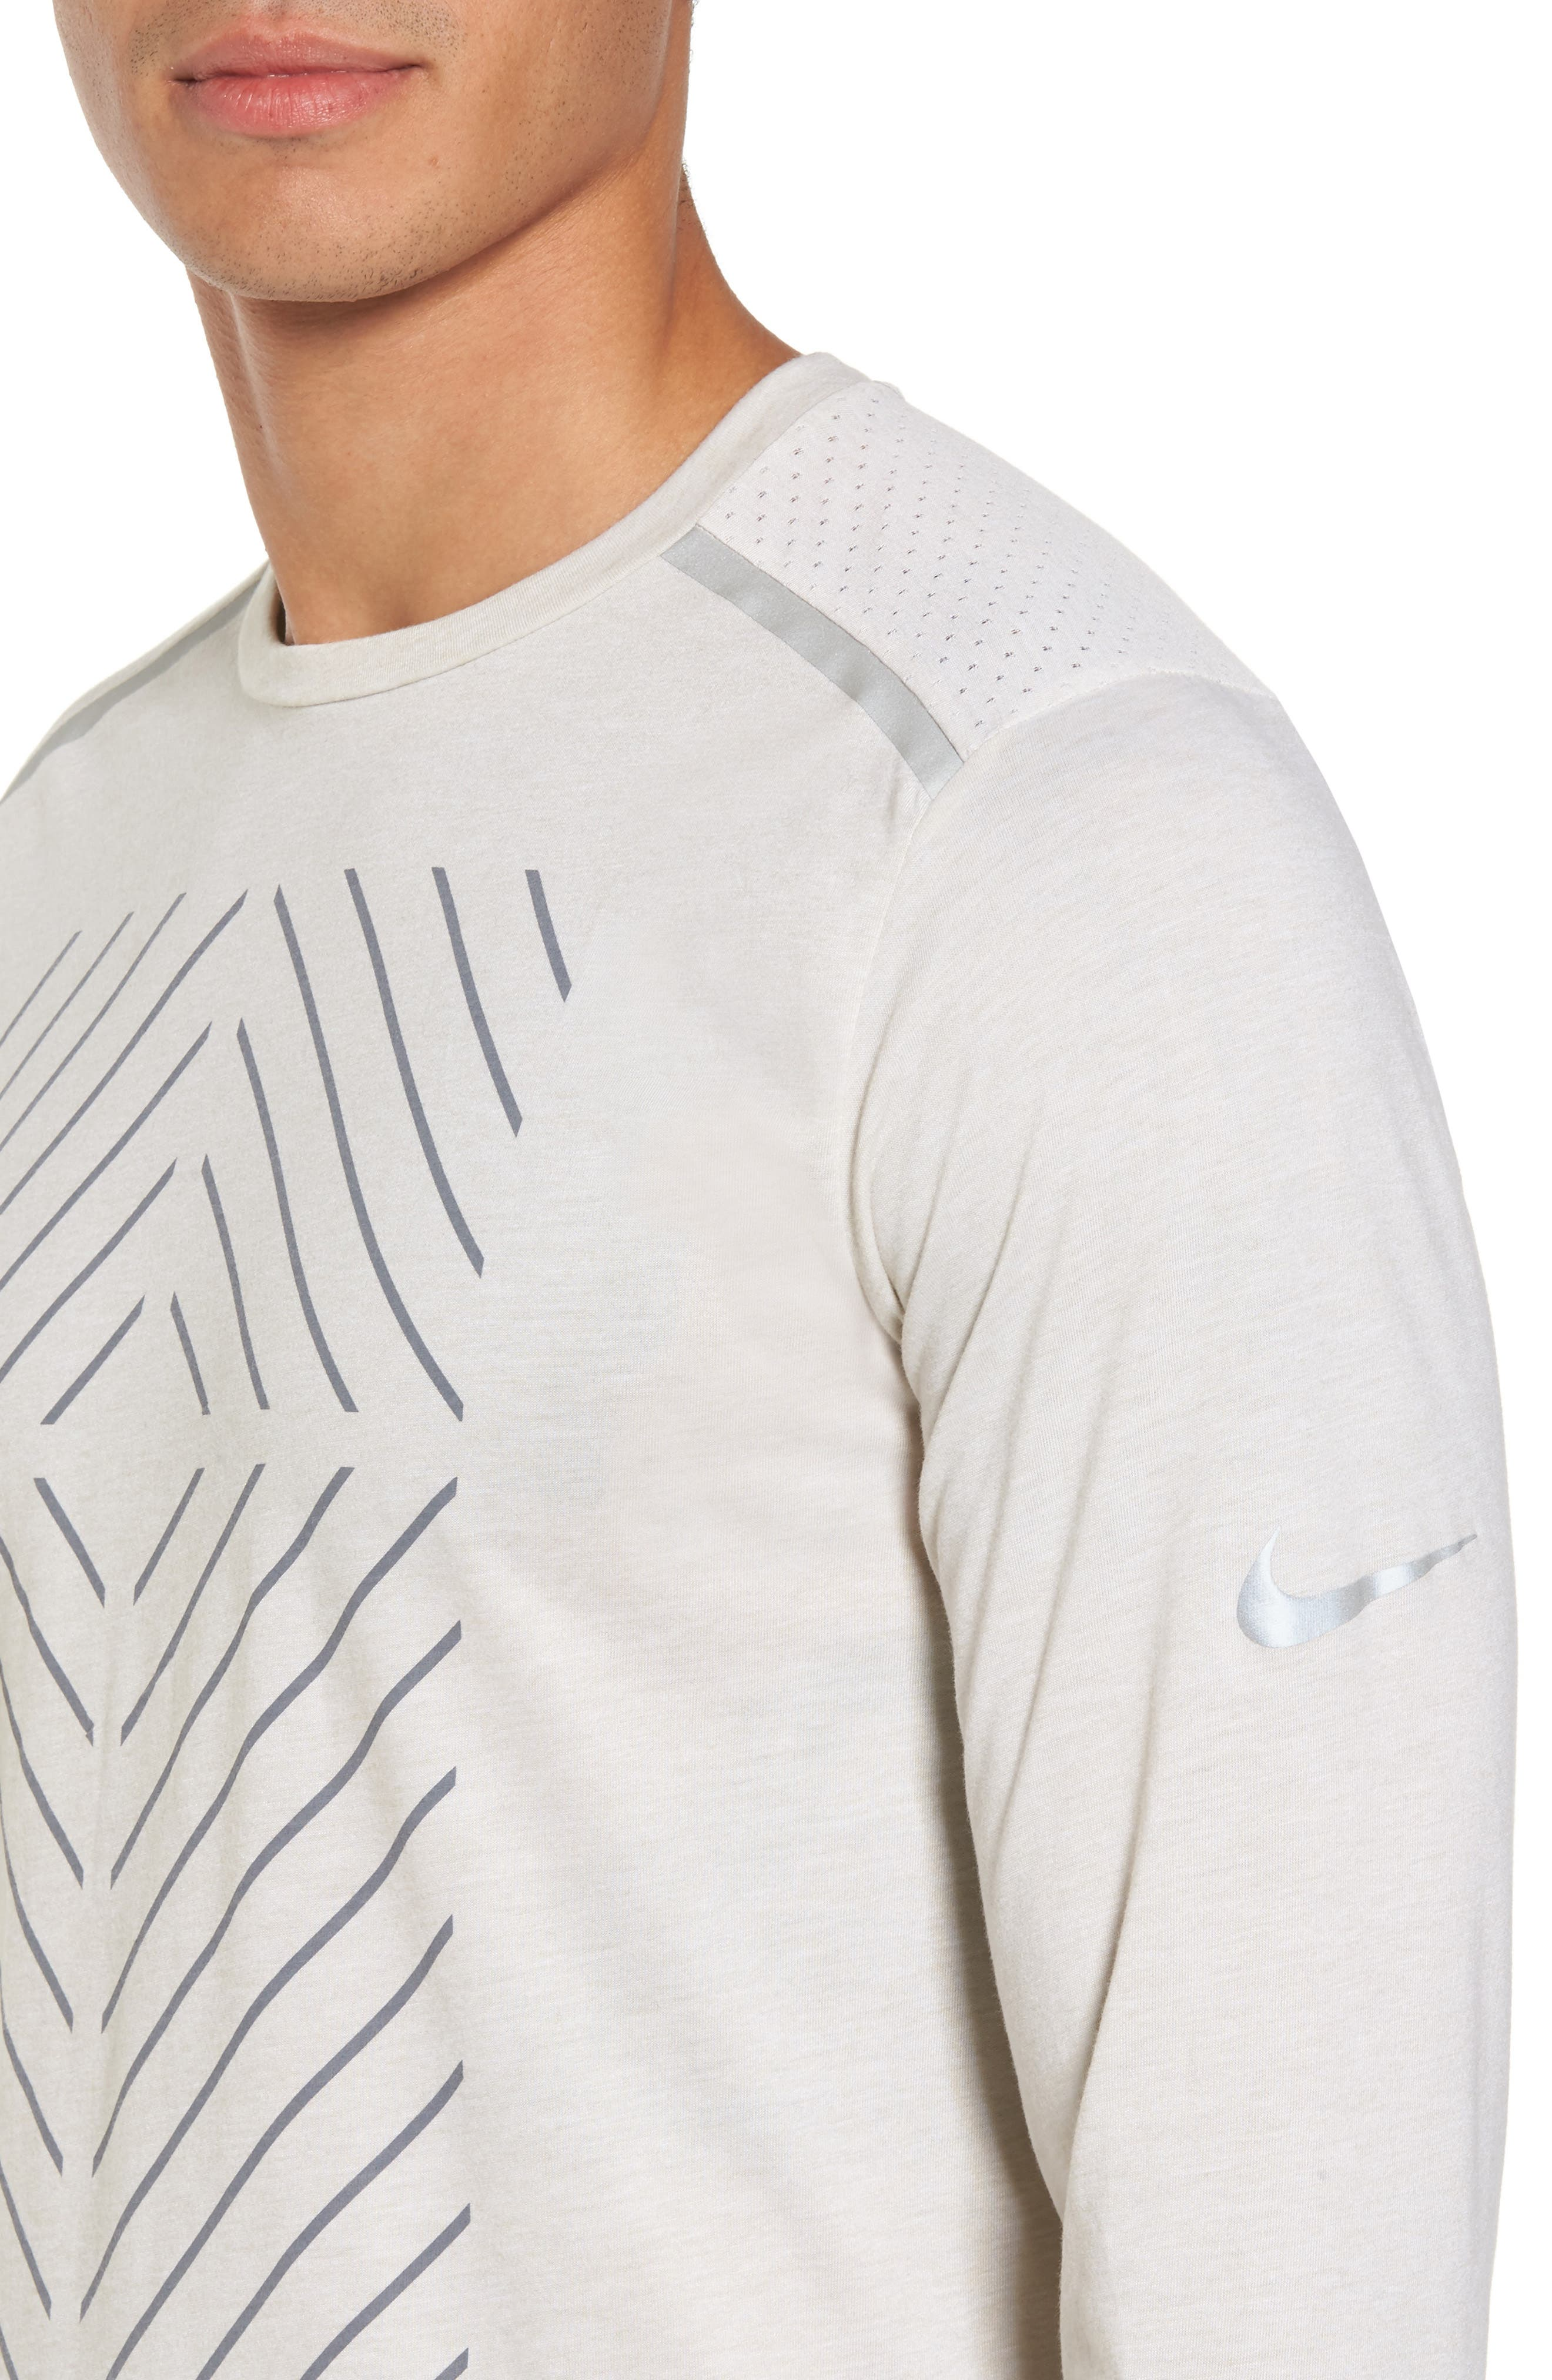 Tailwind Long Sleeve Running T-Shirt,                             Alternate thumbnail 4, color,                             Light Bone/ Heather